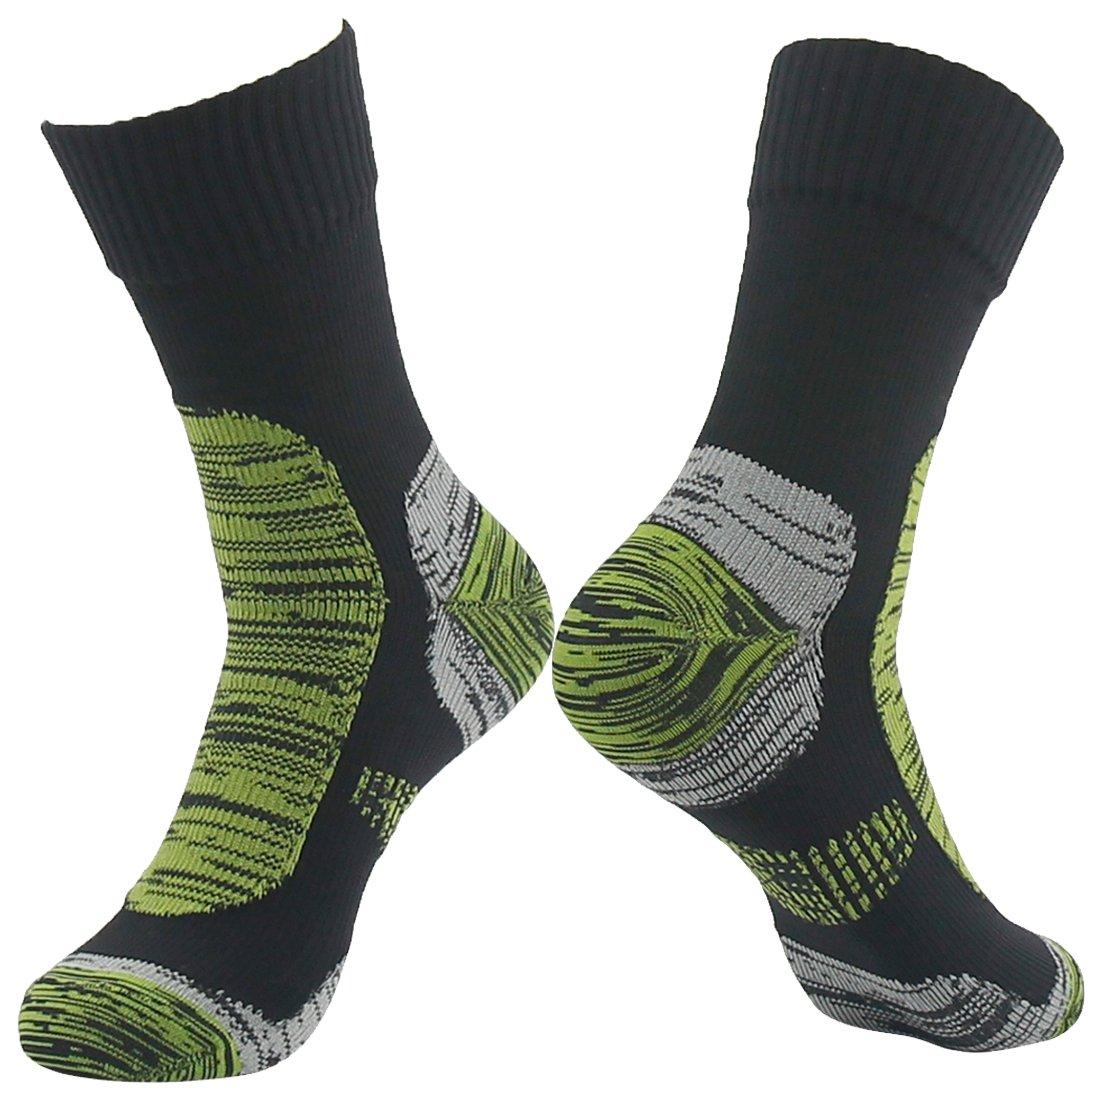 RANDY SUN 100% Waterproof Hiking Socks, Mens' Half-Cushion Dry Multisport Sock Moisture Control & Comfort Medium by RANDY SUN